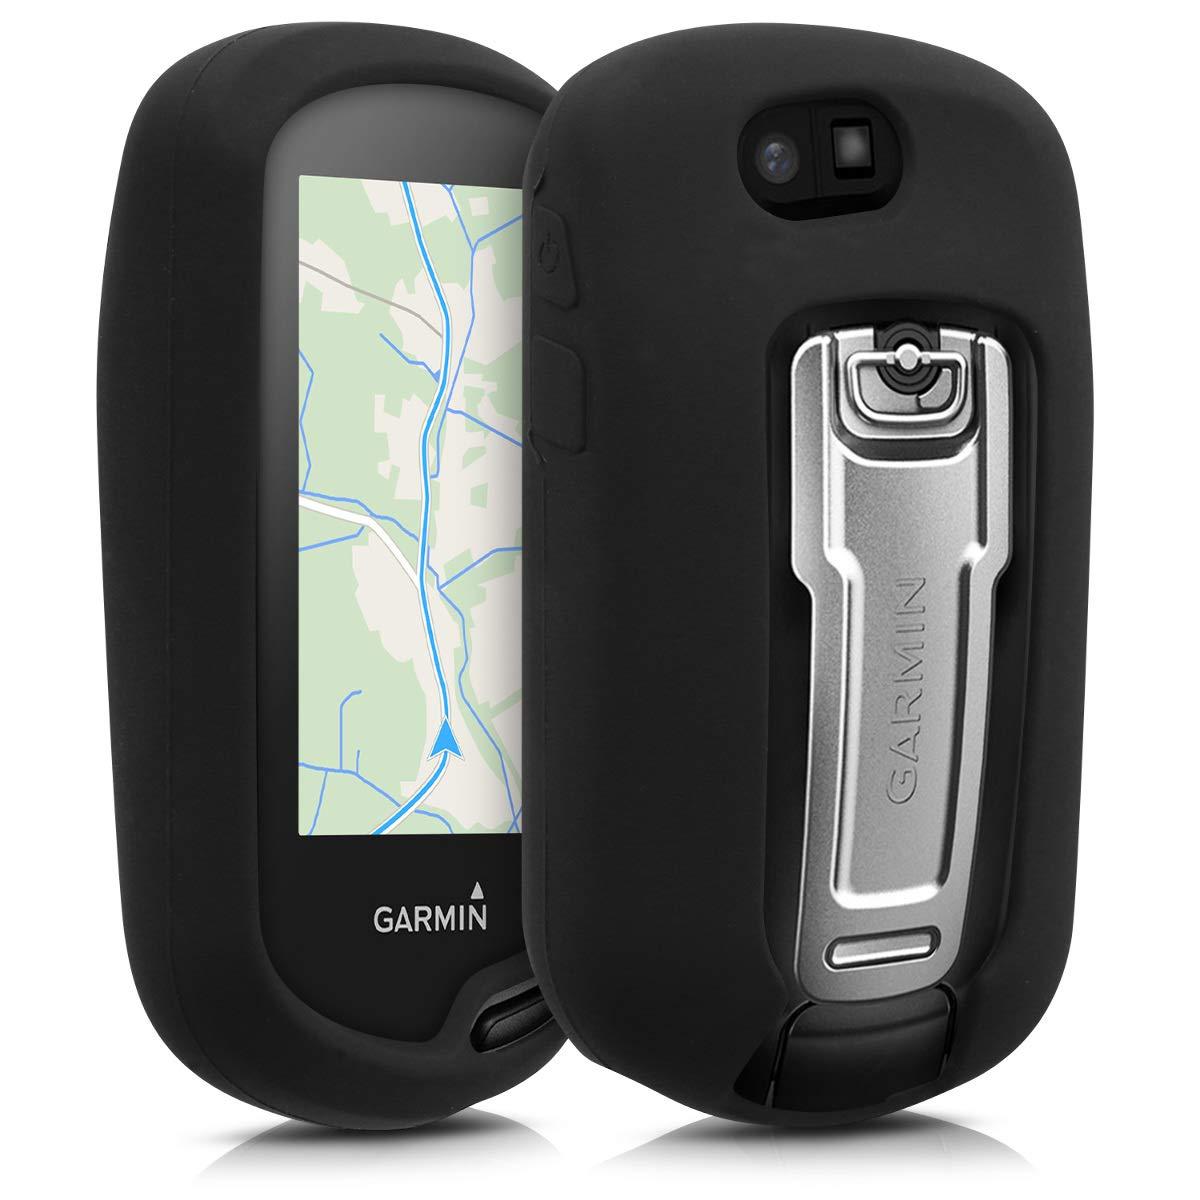 kwmobile Case for Garmin Oregon 700 / 750t - GPS handset navigation system silicone protective case - outdoor navigation device case cover Black